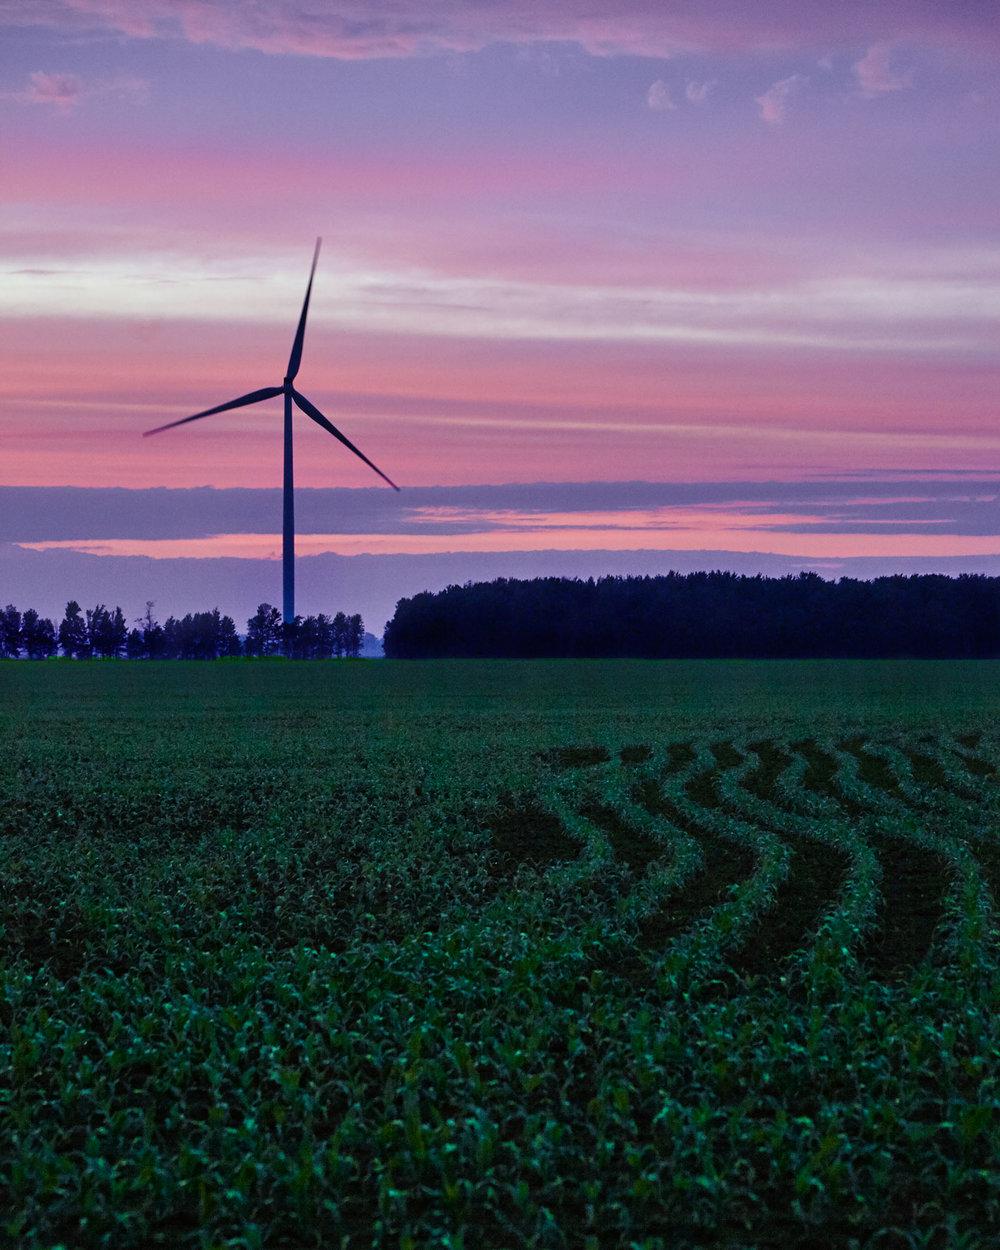 Sunset over farmland, Brinston, Ontario